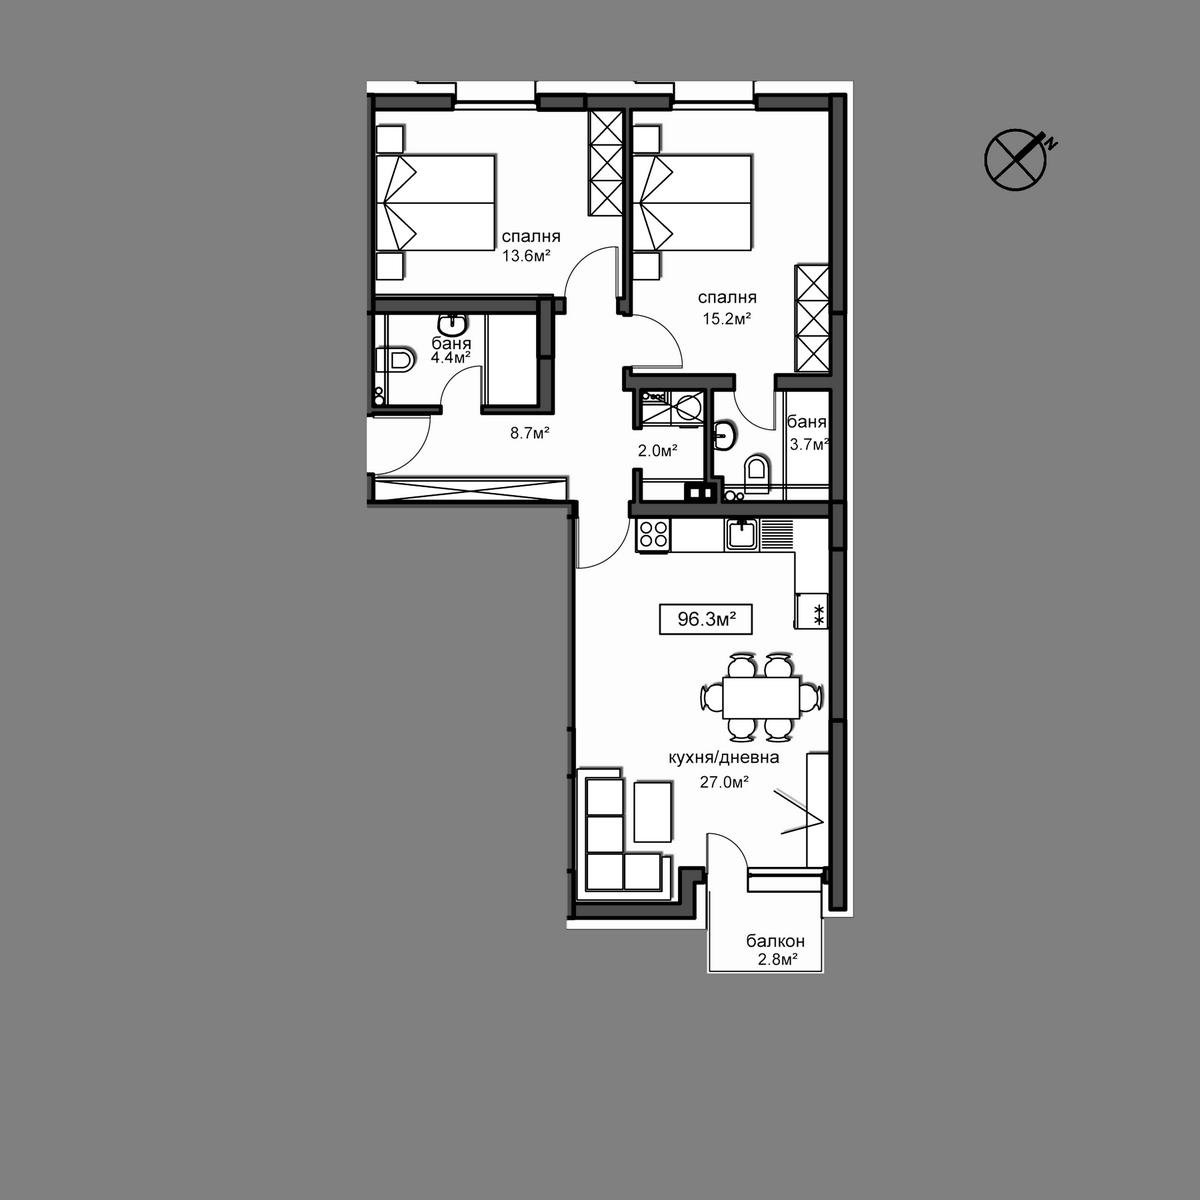 Продава апартамент ново строителство - Апартамент  Б12